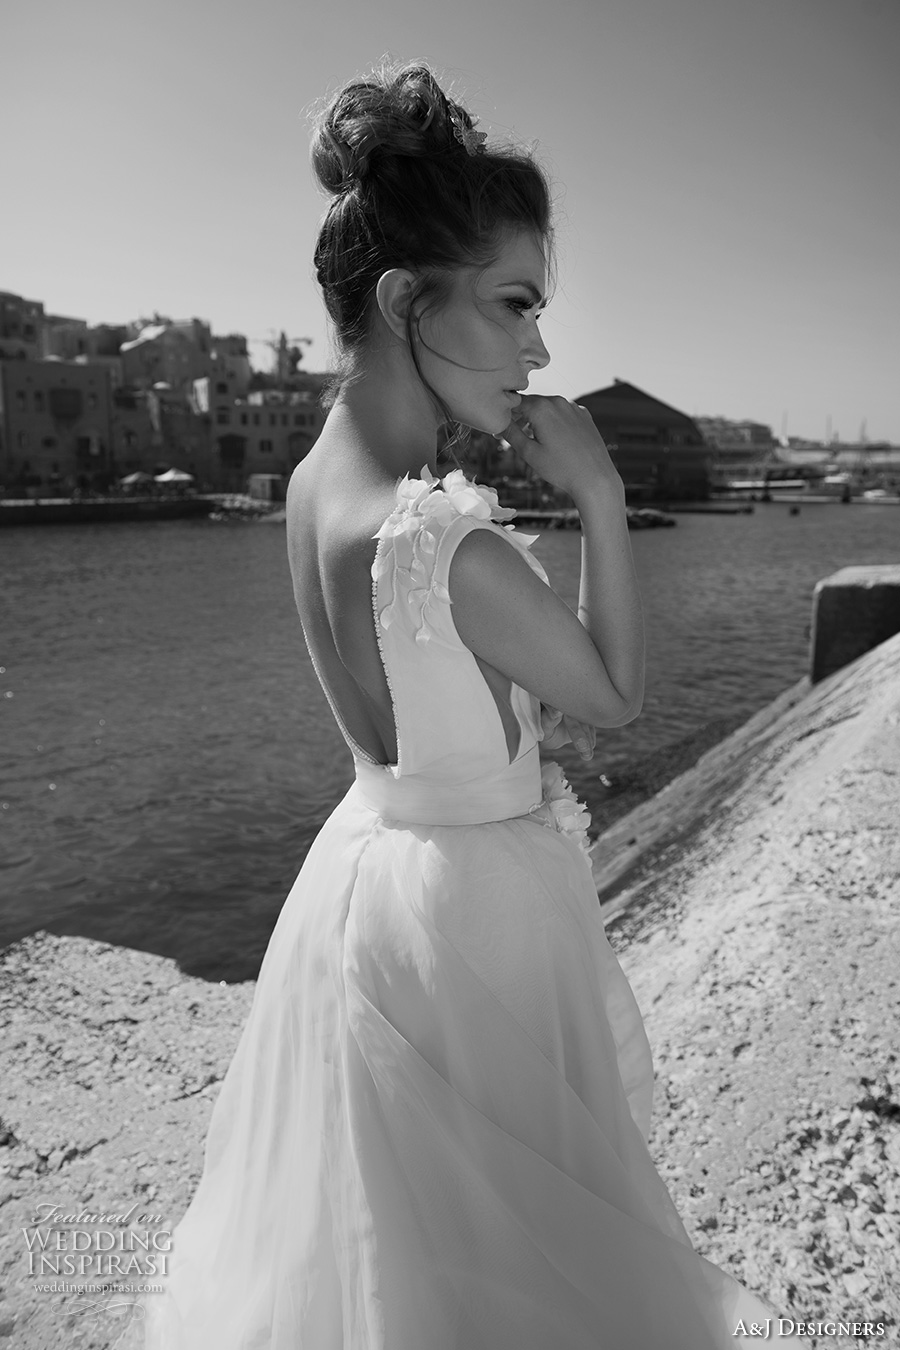 Designers Wedding Dress 67 Amazing julie vino a j